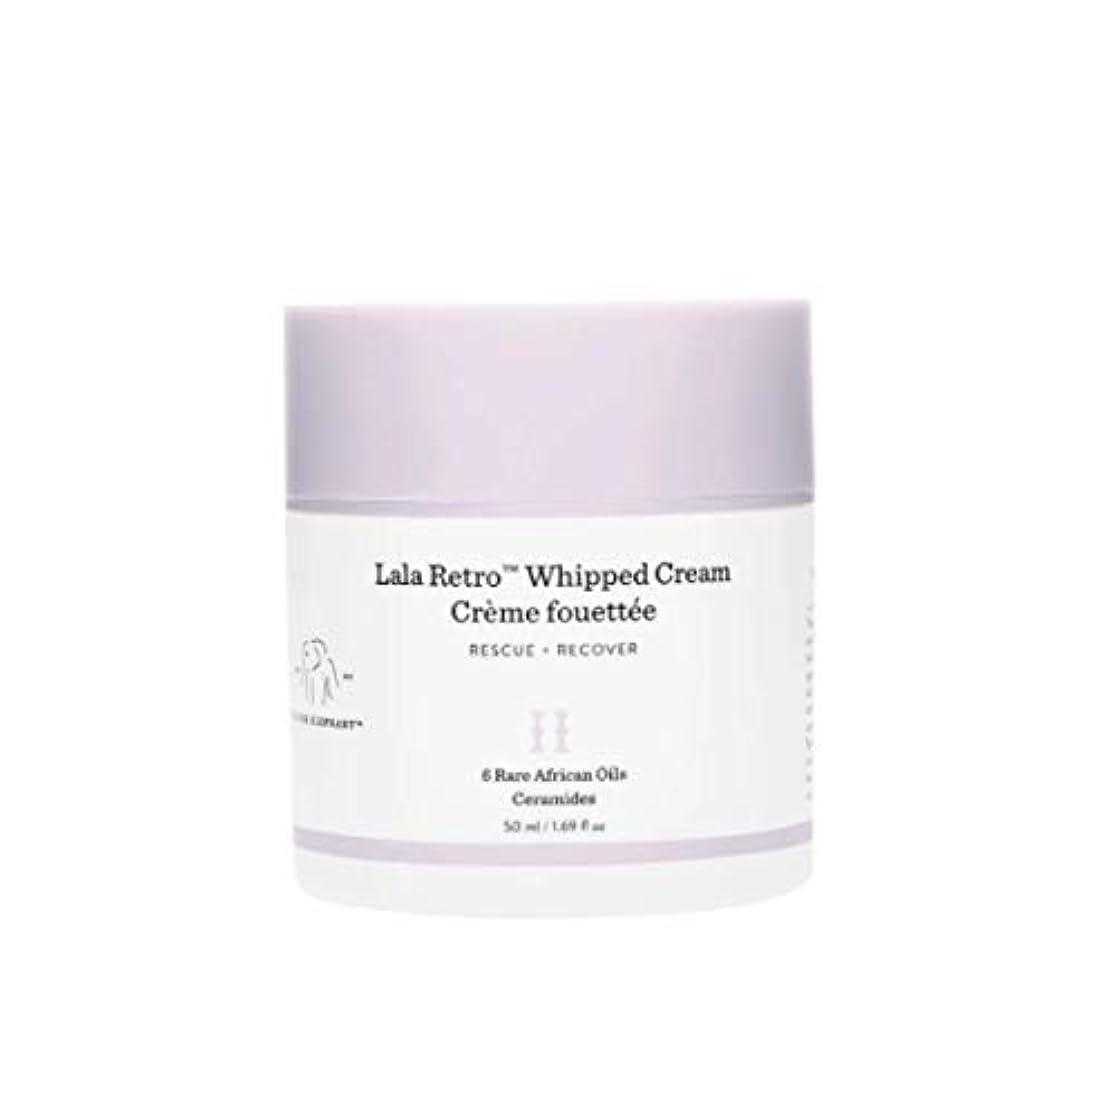 DRUNK ELEPHANT Lala Retro Whipped Cream 1.69 oz/ 50 ml ドランクエレファント ララレトロ ホイップドクリーム 1.69 oz/ 50 ml